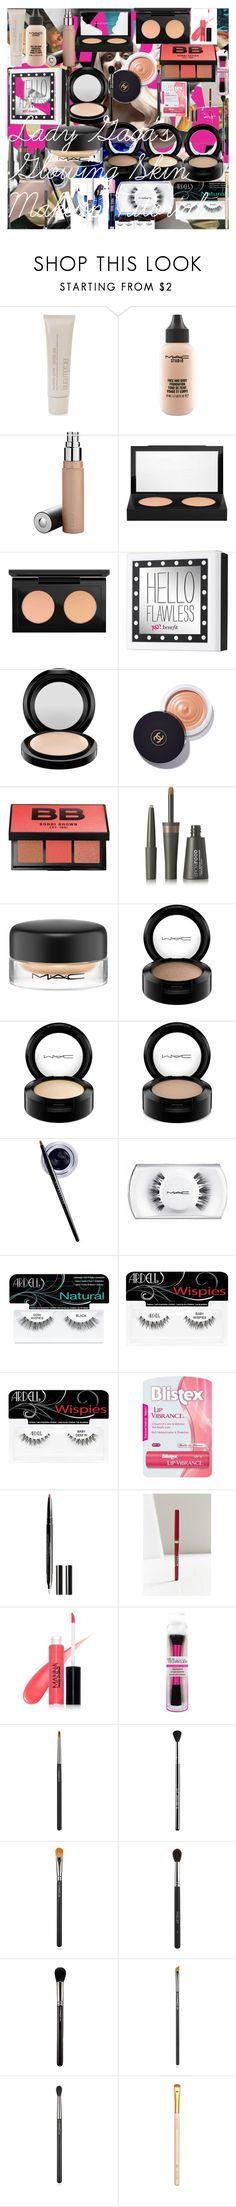 Lady Gaga's Glowing Skin Makeup Tutorial by oroartye-1 on Polyvore featuring beauty, Benefit, MAC Cosmetics, Chanel, Bobbi Brown Cosmetics, Laura Mercier, Inglot, LashFood, Stila and Manna Kadar Cosmetics